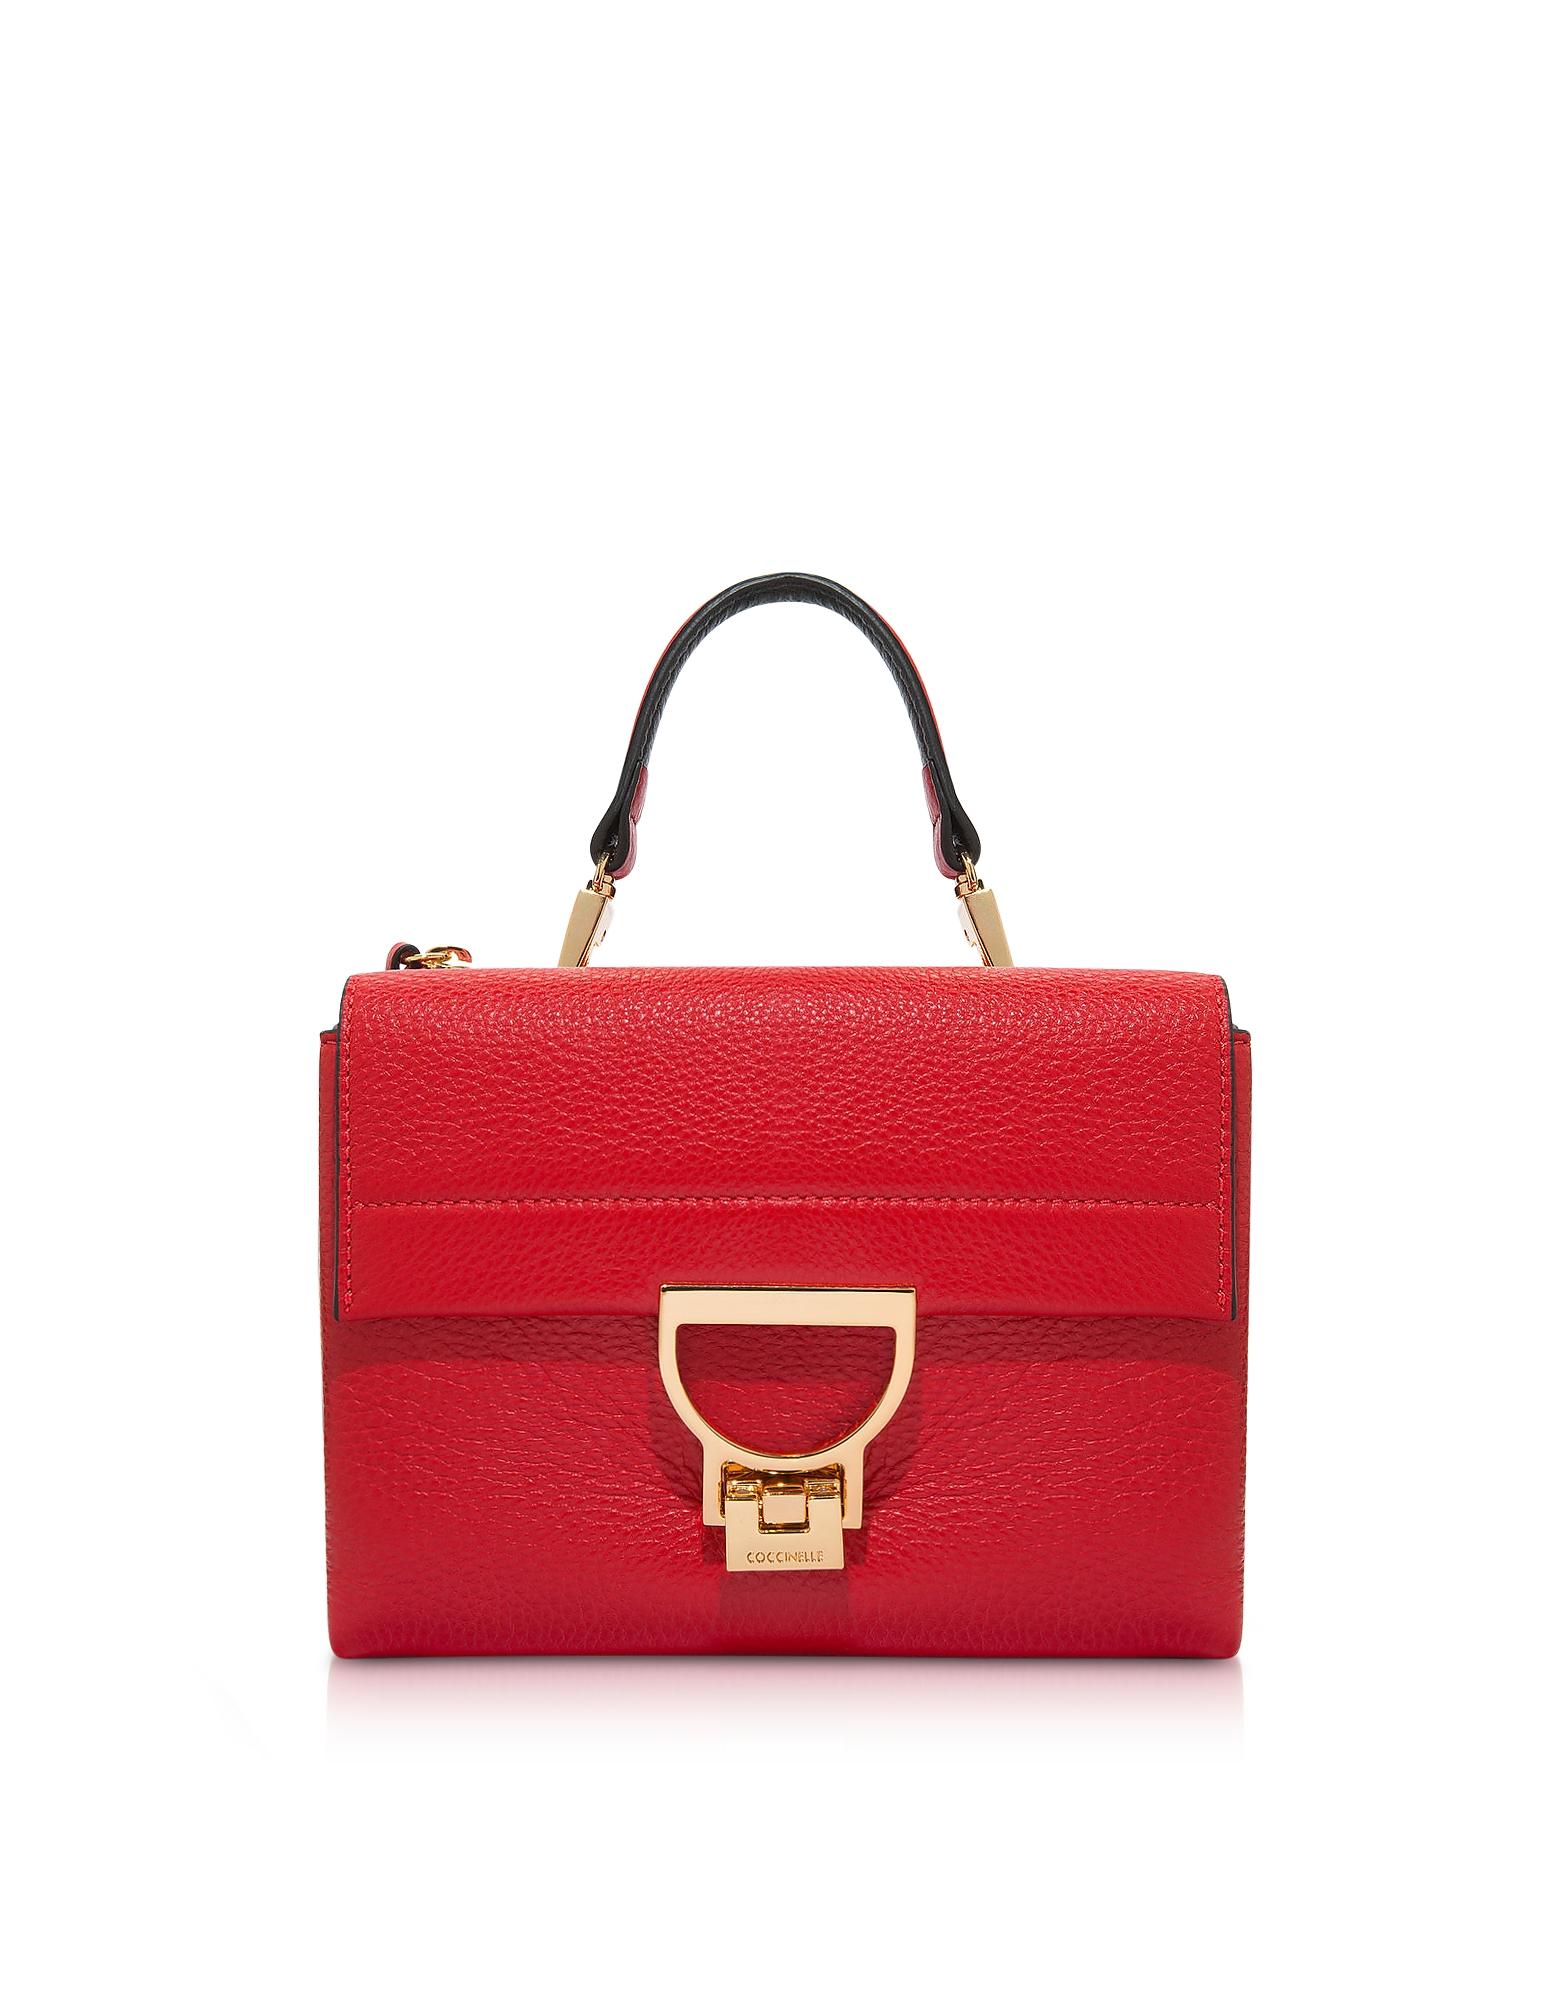 Coccinelle Handbags, Coquelicot Pebbled Leather Arlettis Mini Bag w/Shoulder Strap